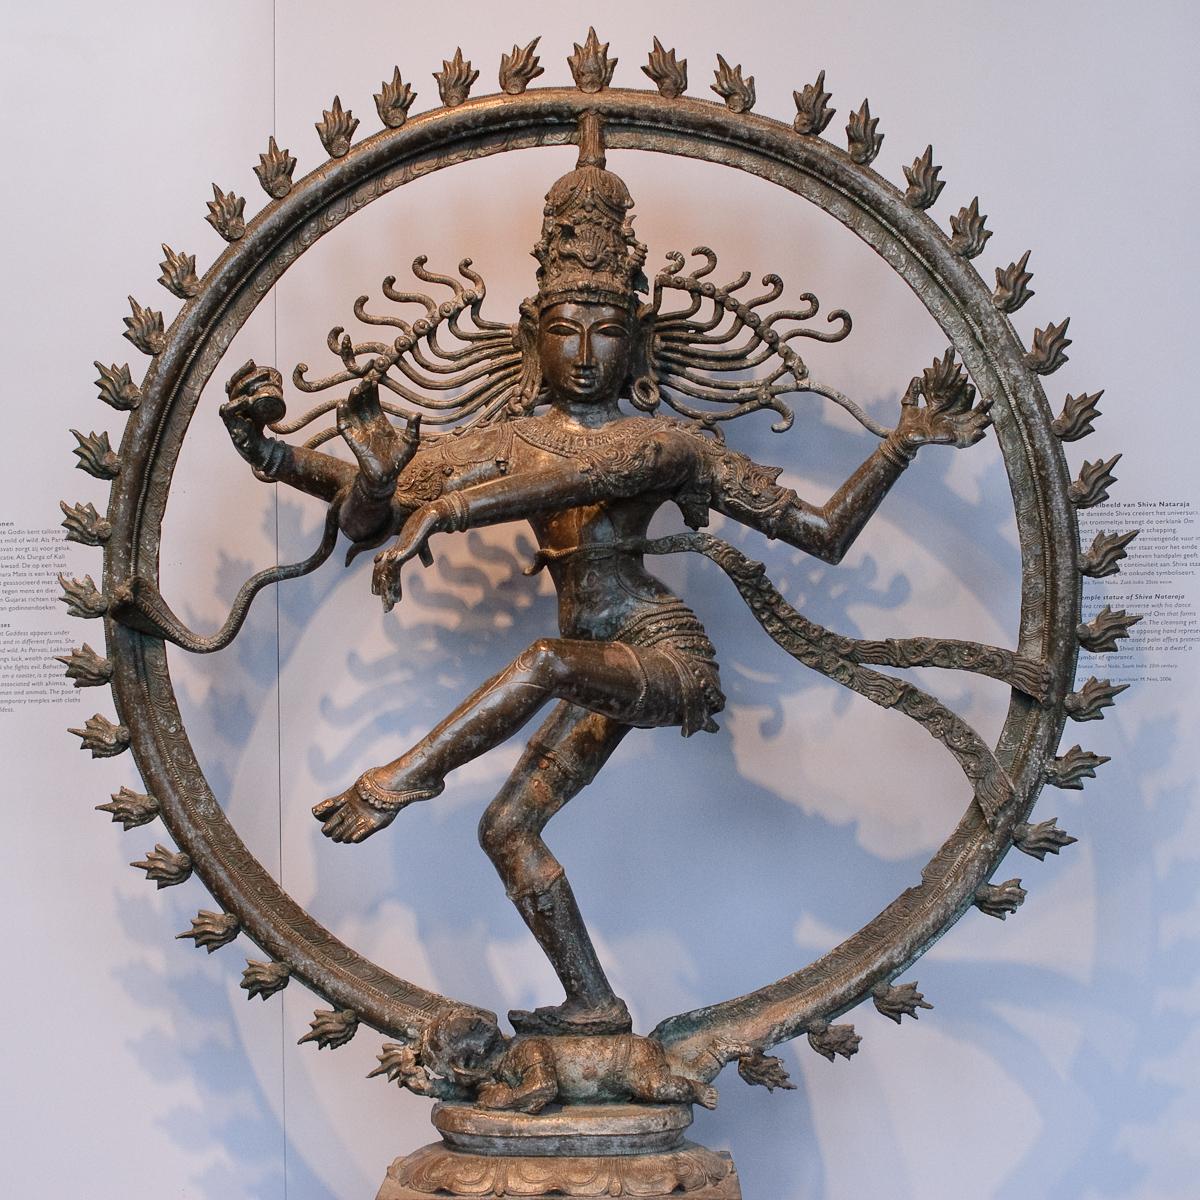 http://upload.wikimedia.org/wikipedia/commons/9/98/WLANL_-_23dingenvoormusea_-_Shiva_Nataraja.jpg